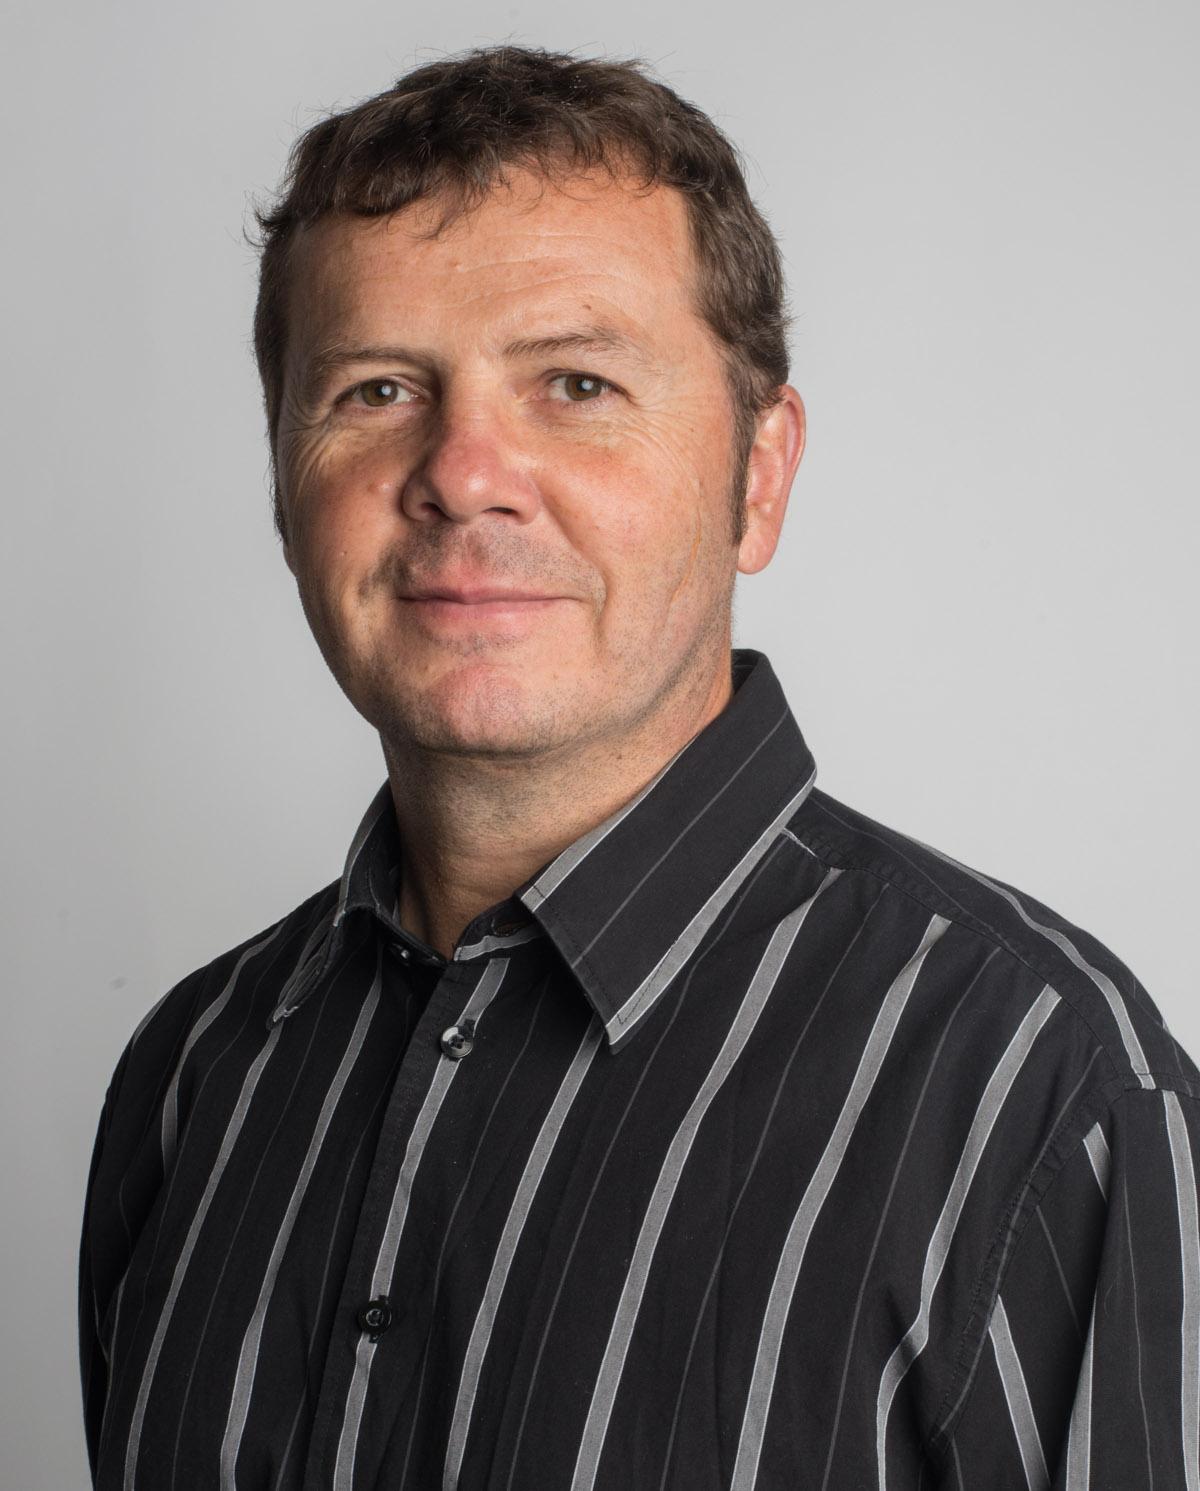 Mario Niederseer